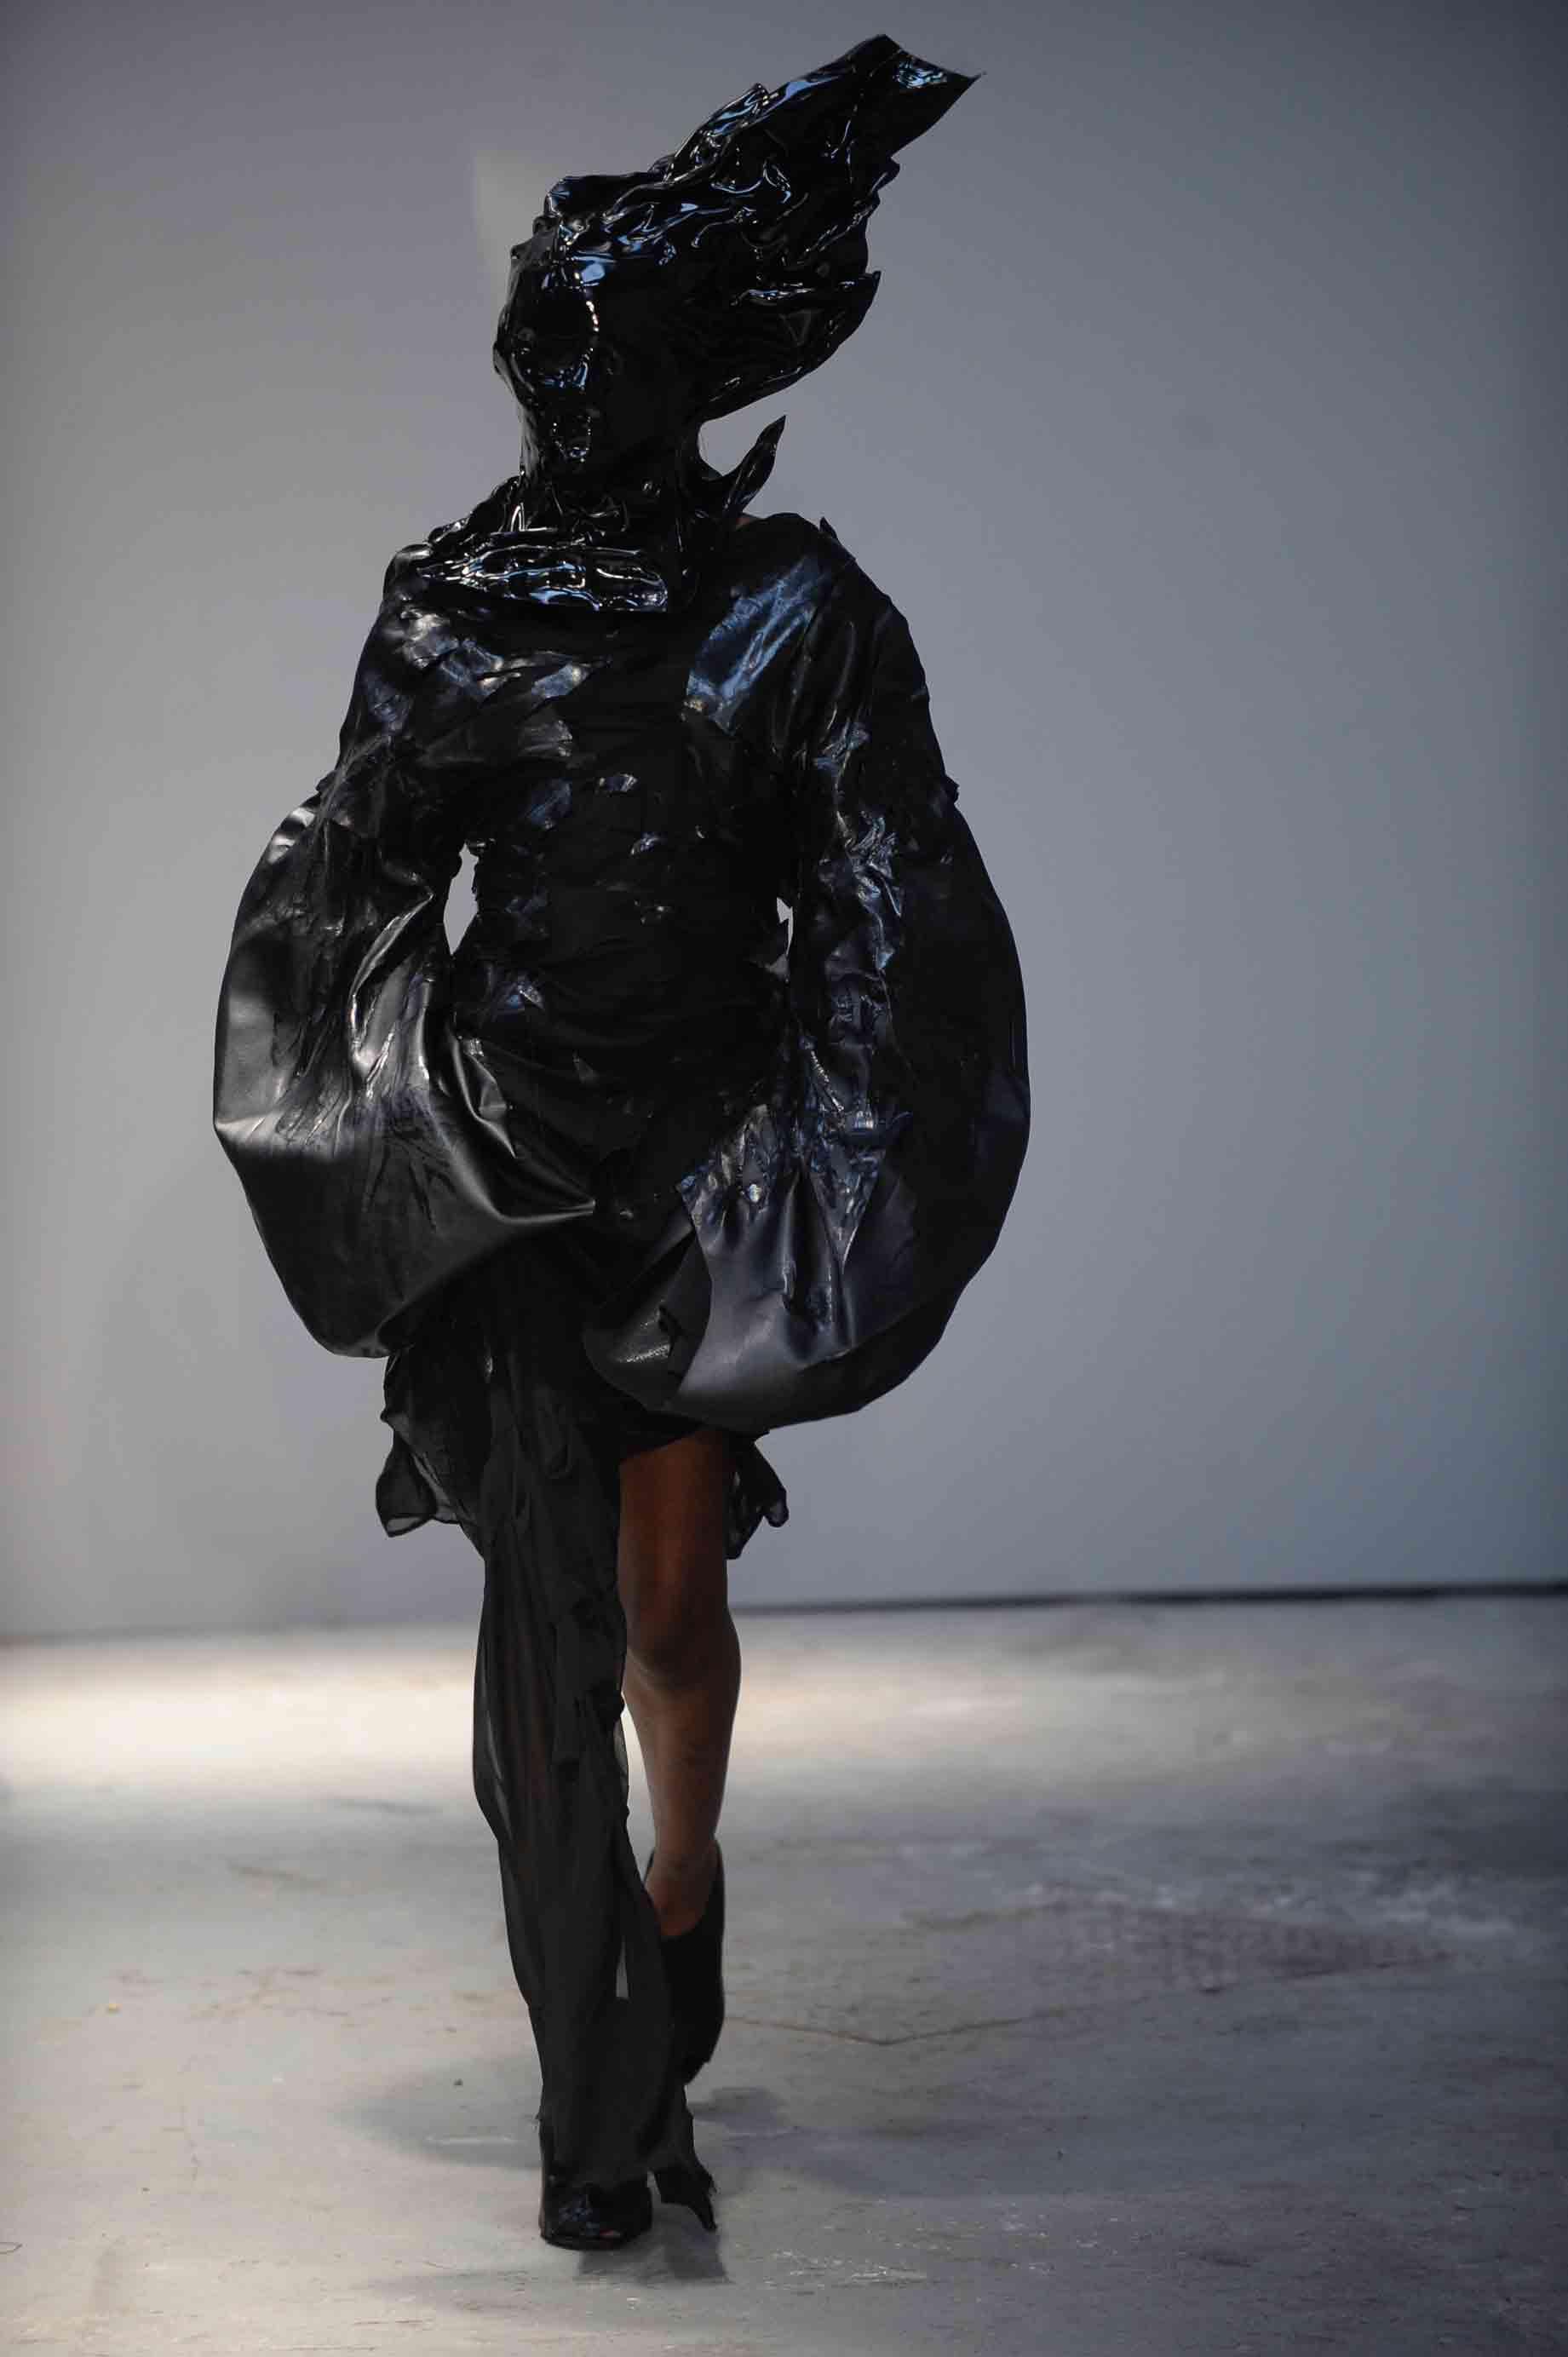 Gayane Arzumanova, BA (Hons) Fashion Design Technology